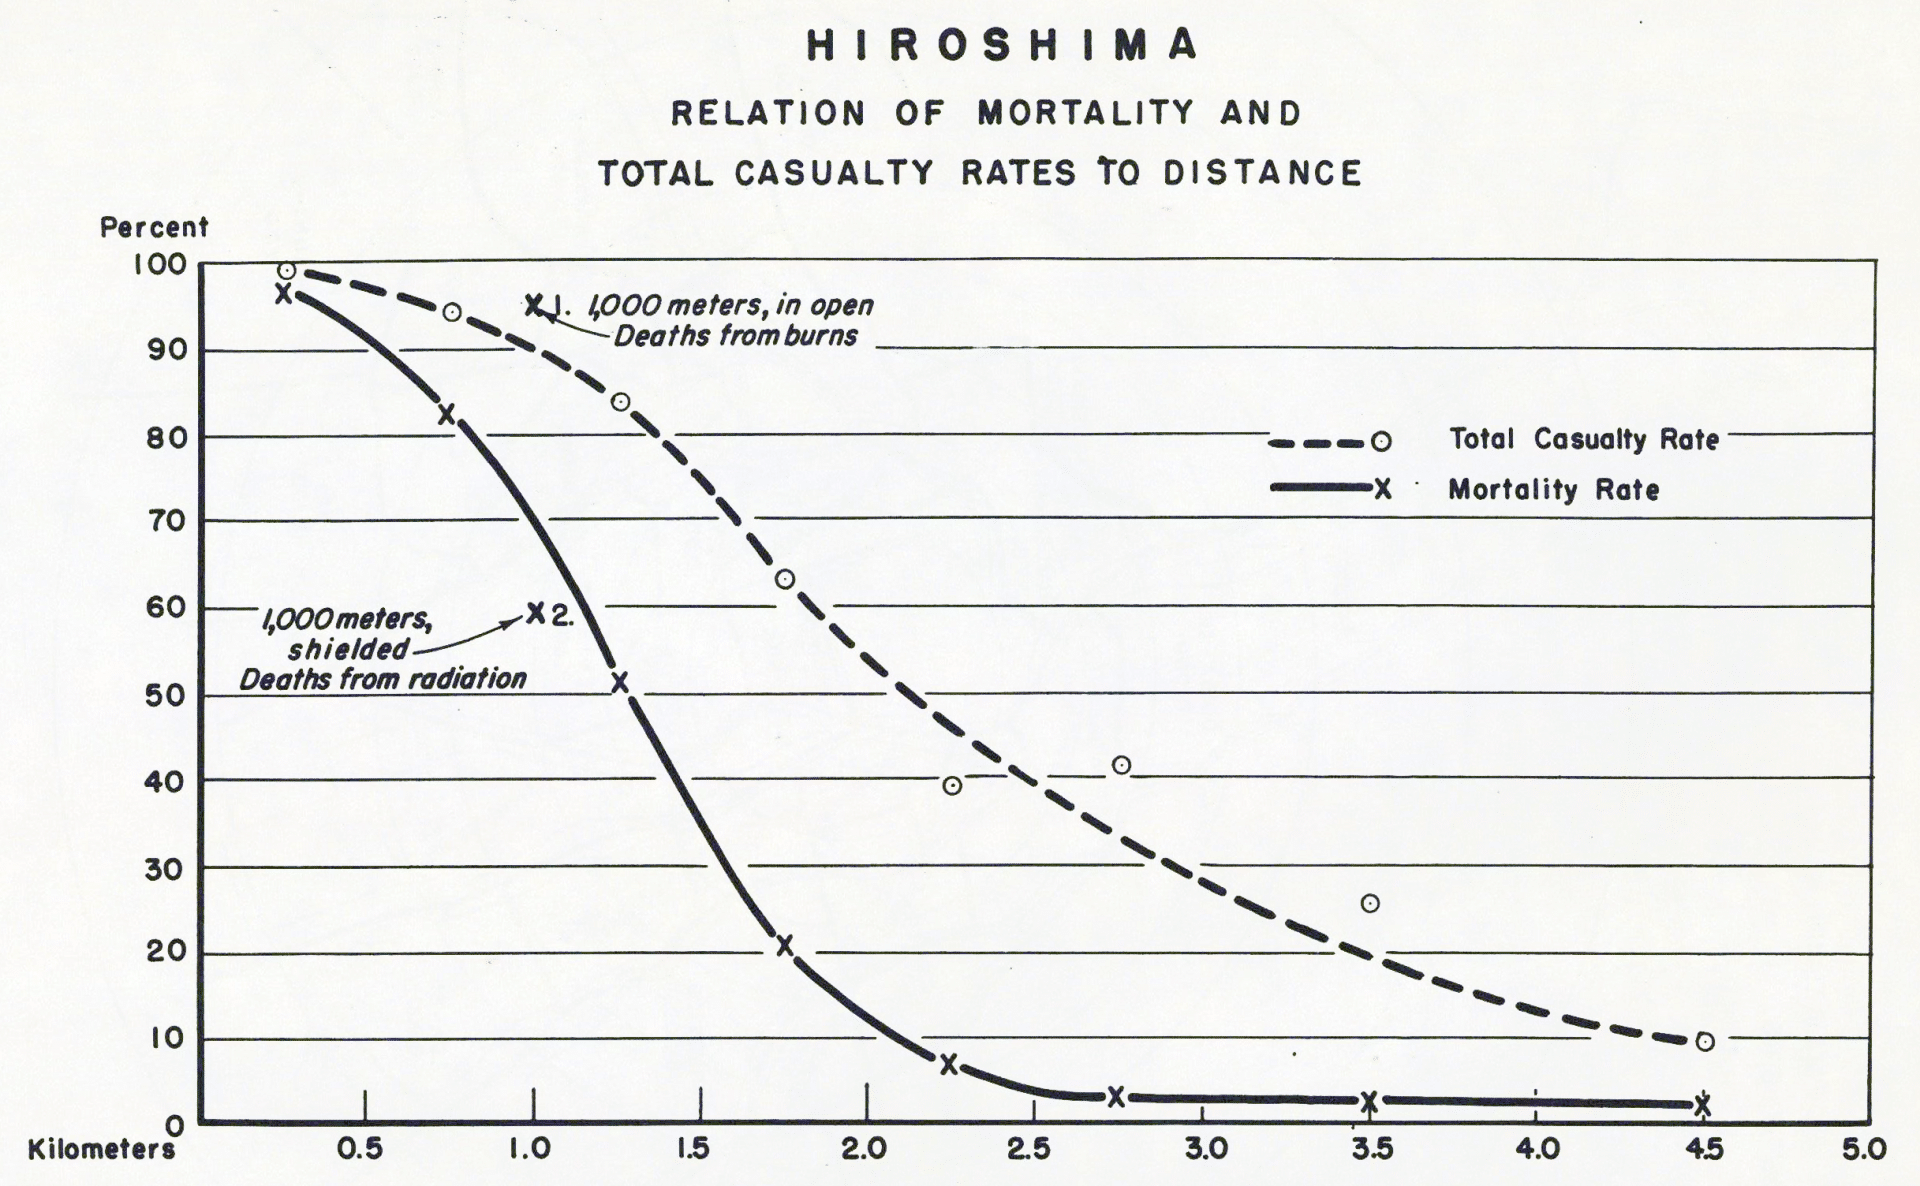 mortality casualties hiroshima 1945 atomic bomb